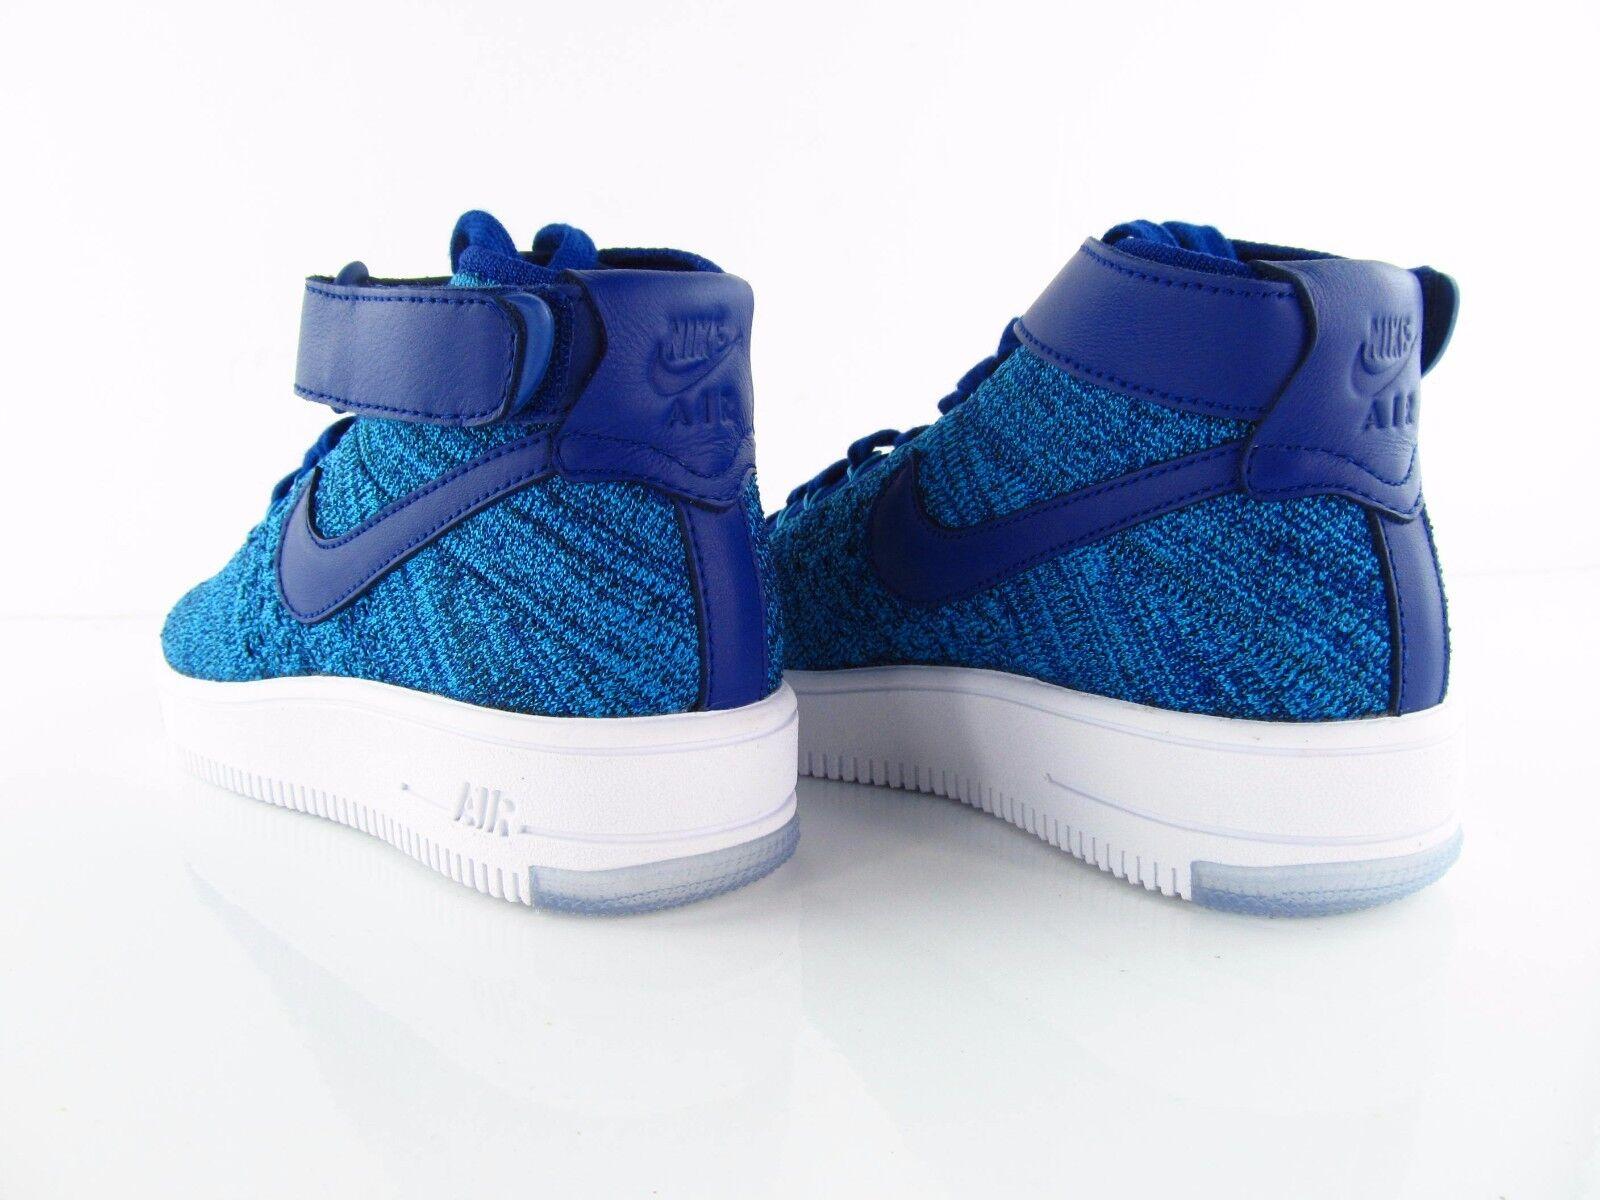 Nike Air Force 1 AF1 Flyknit Blau LAgoon EUR Multicolor New UK_3.5 US_6 EUR LAgoon 36.5 ccdad4